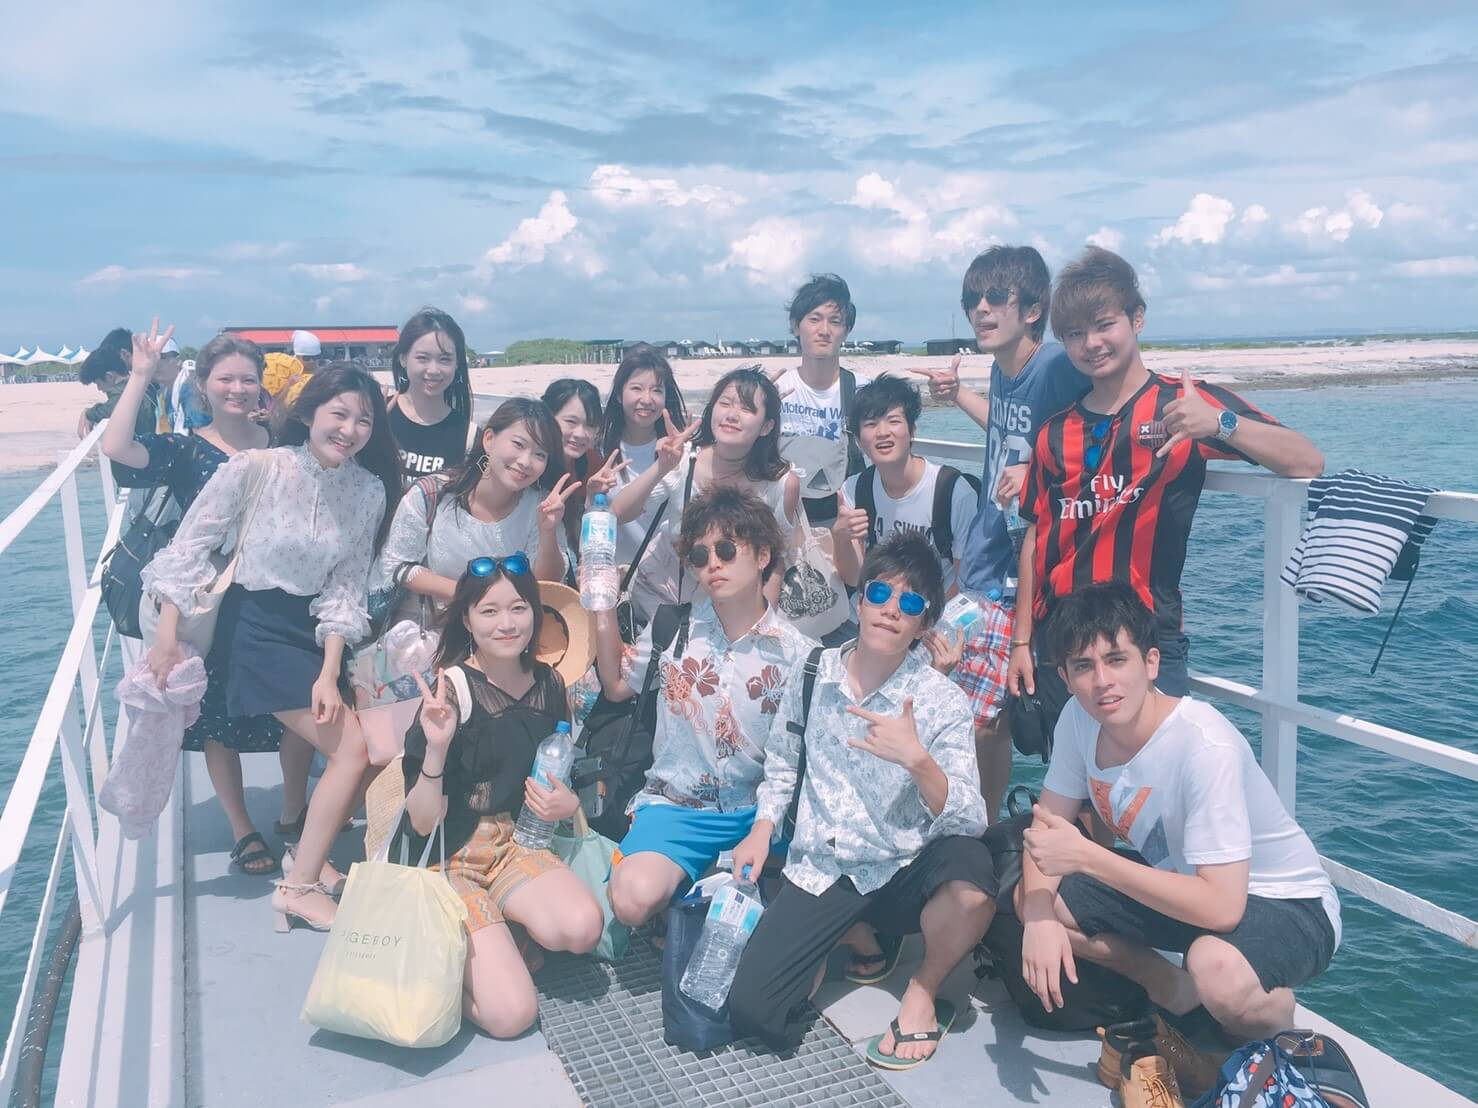 【慶應の部活・サークル紹介】観光事業研究会K-flips